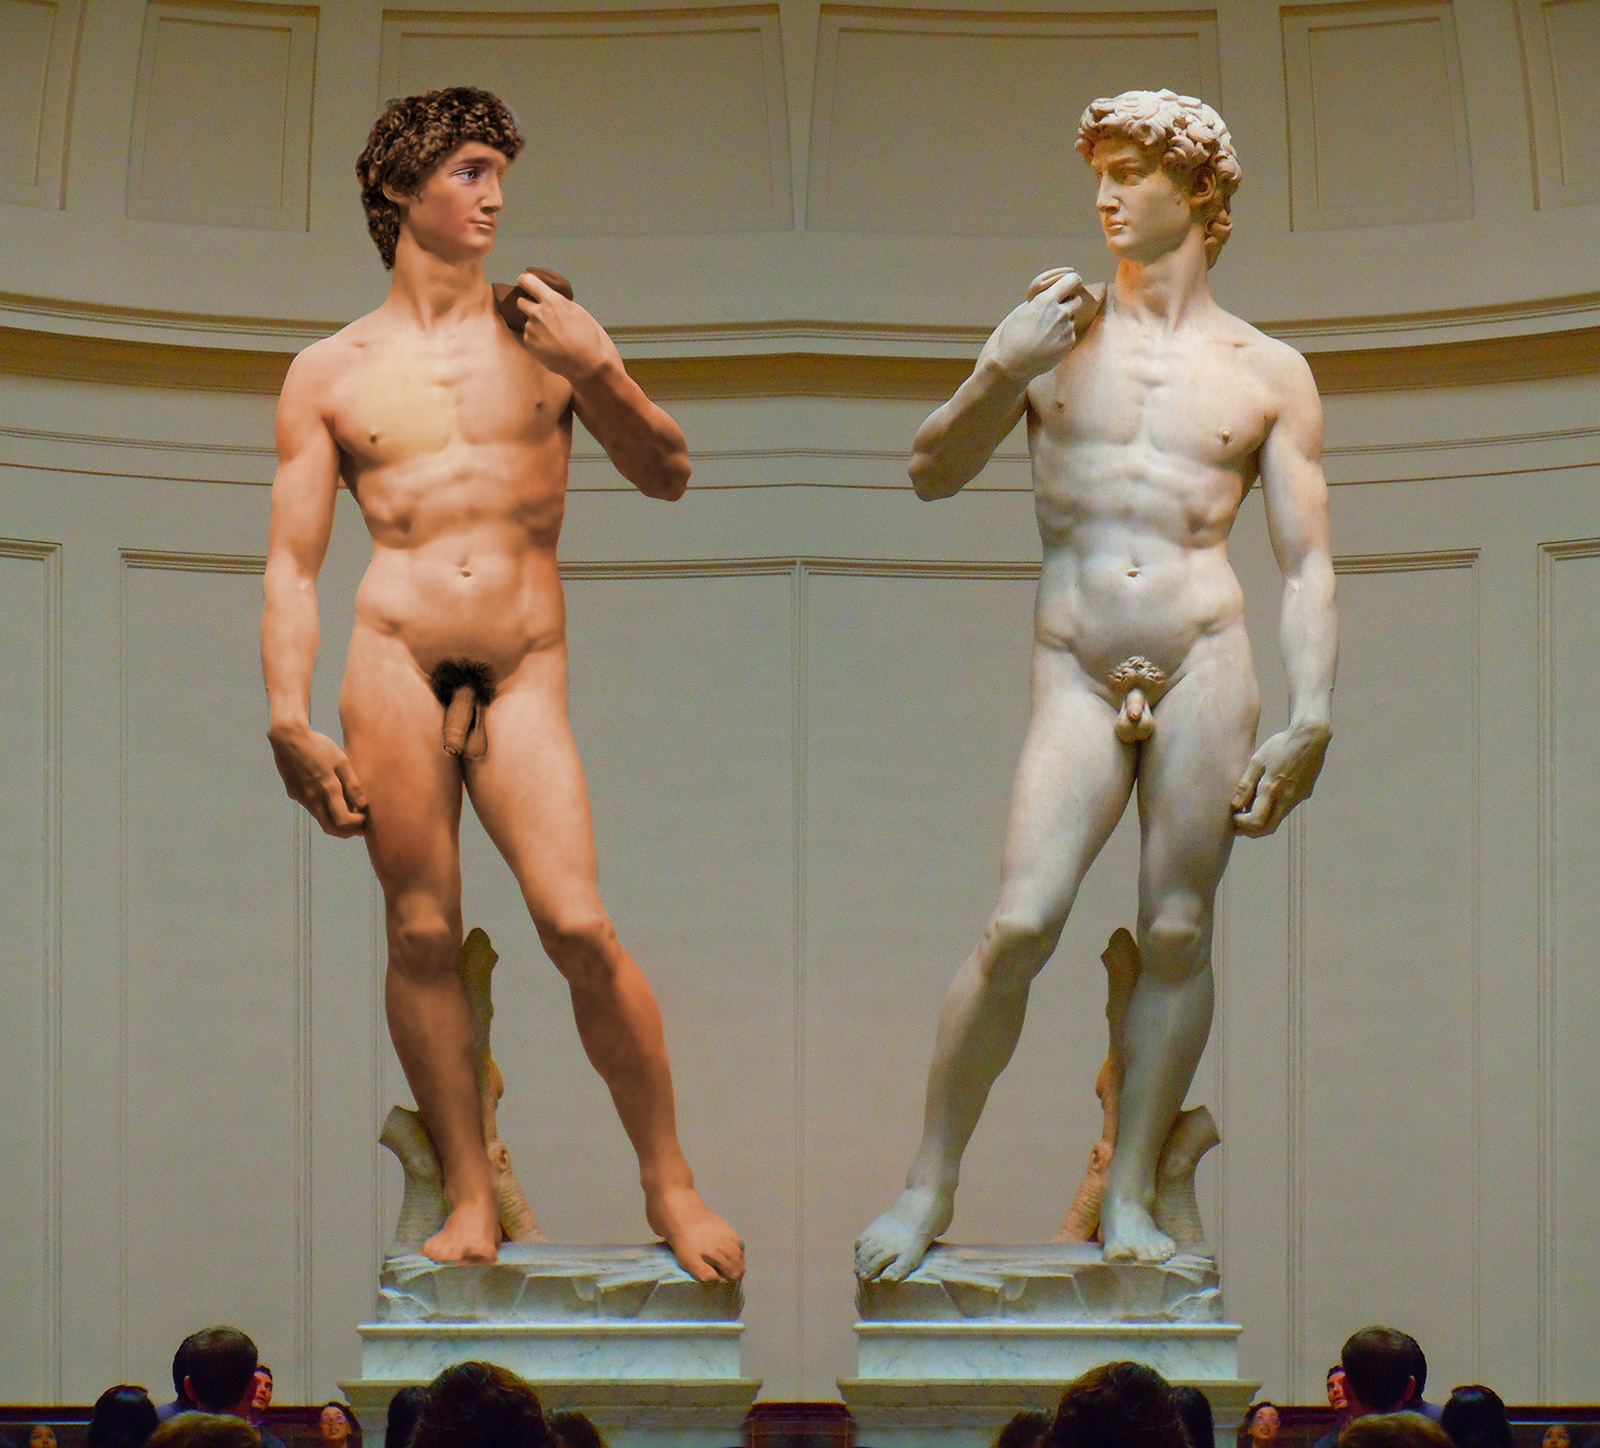 Art Gallery of Masculine Beauty & Homo Eroticism